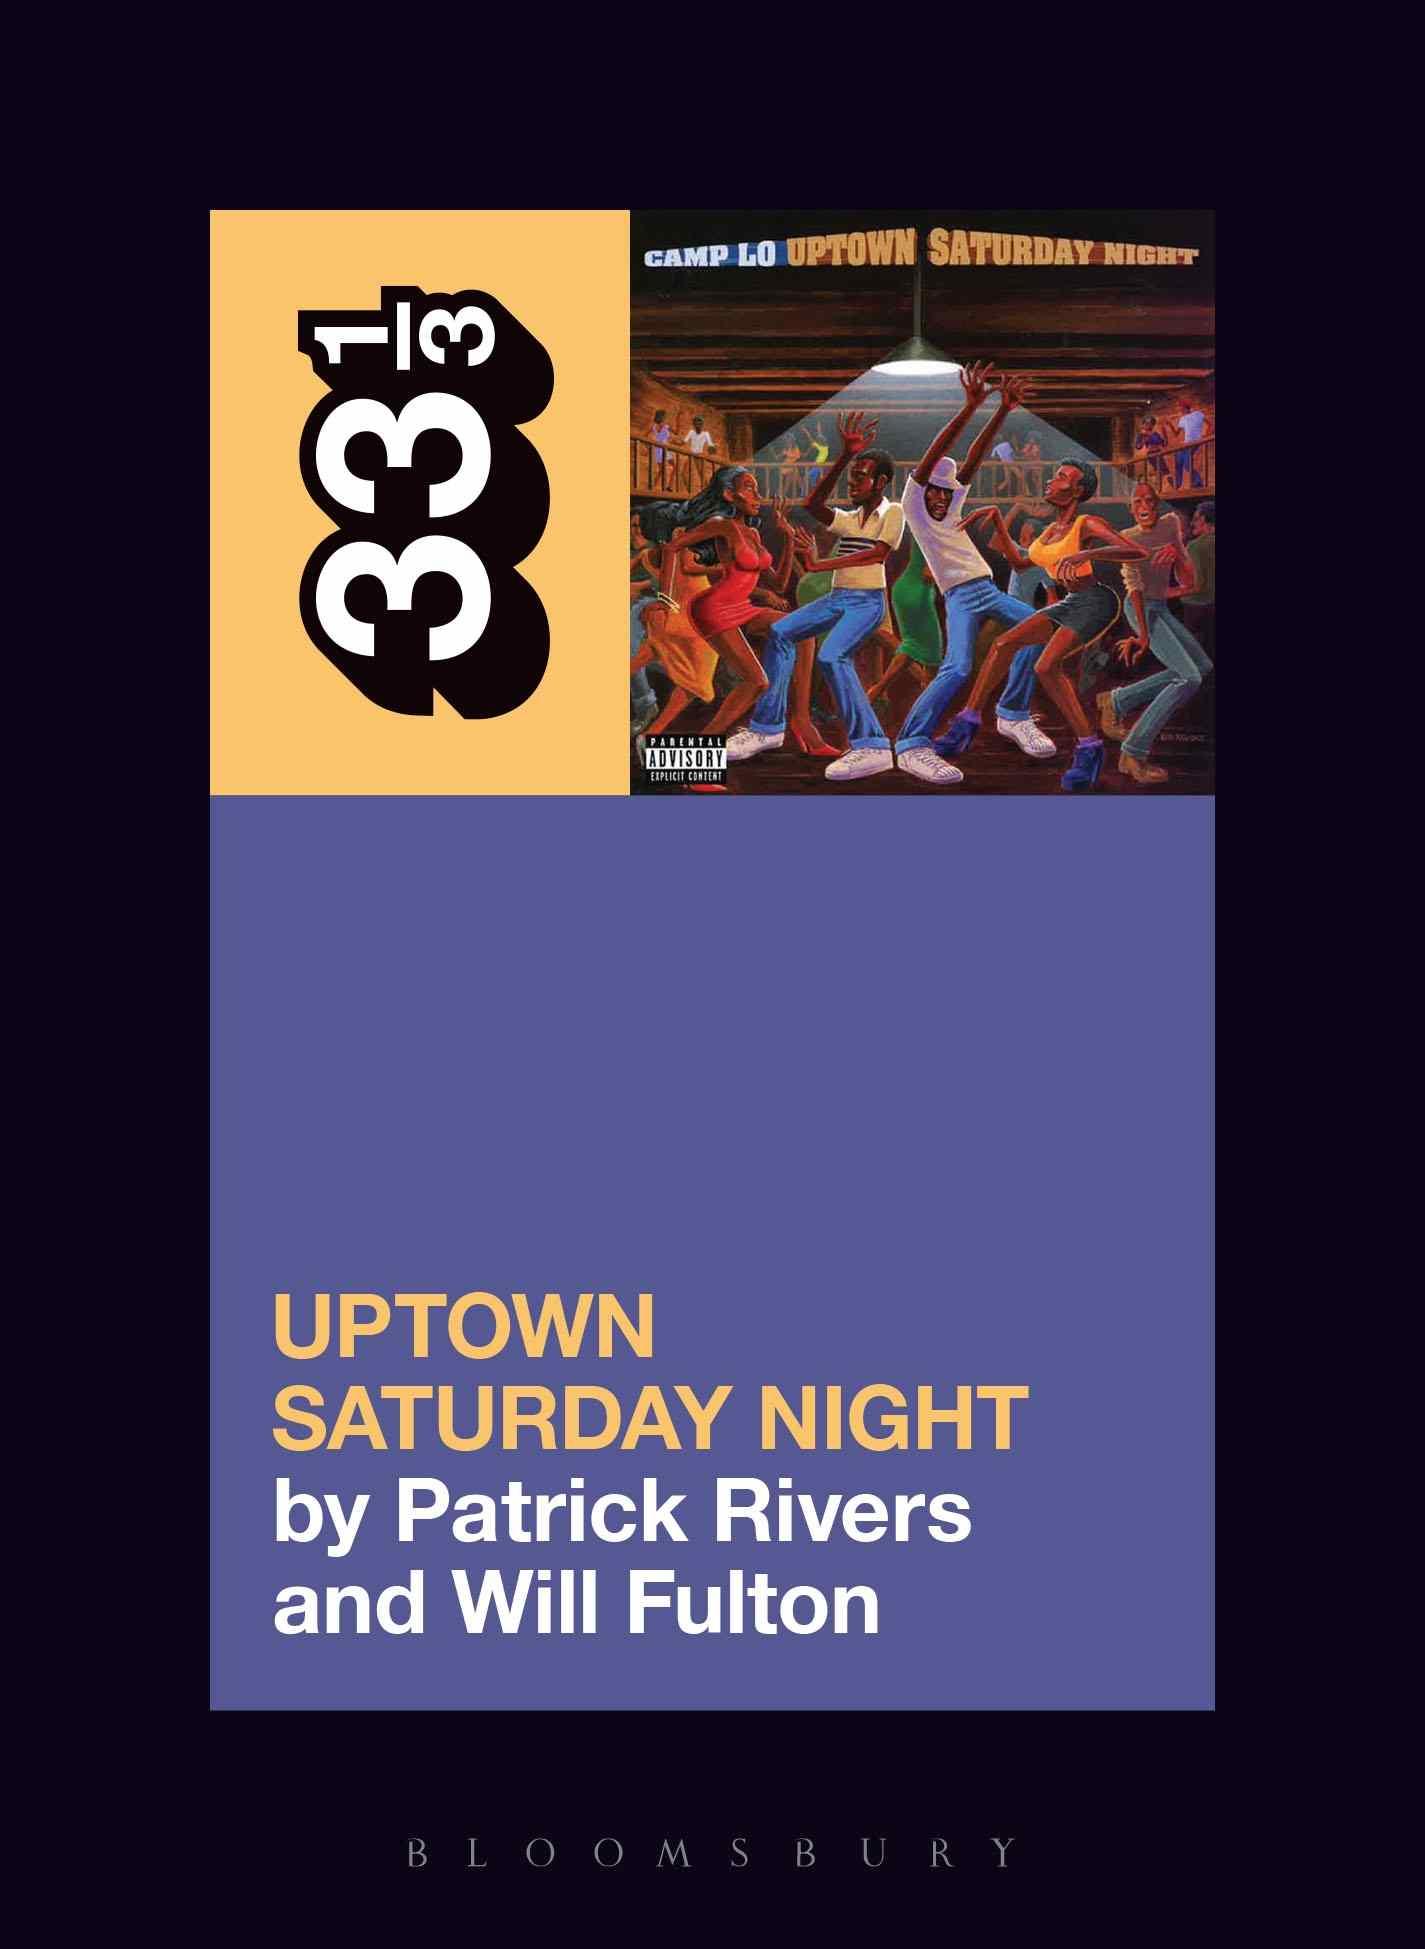 Camp Lo's Uptown Saturday Night